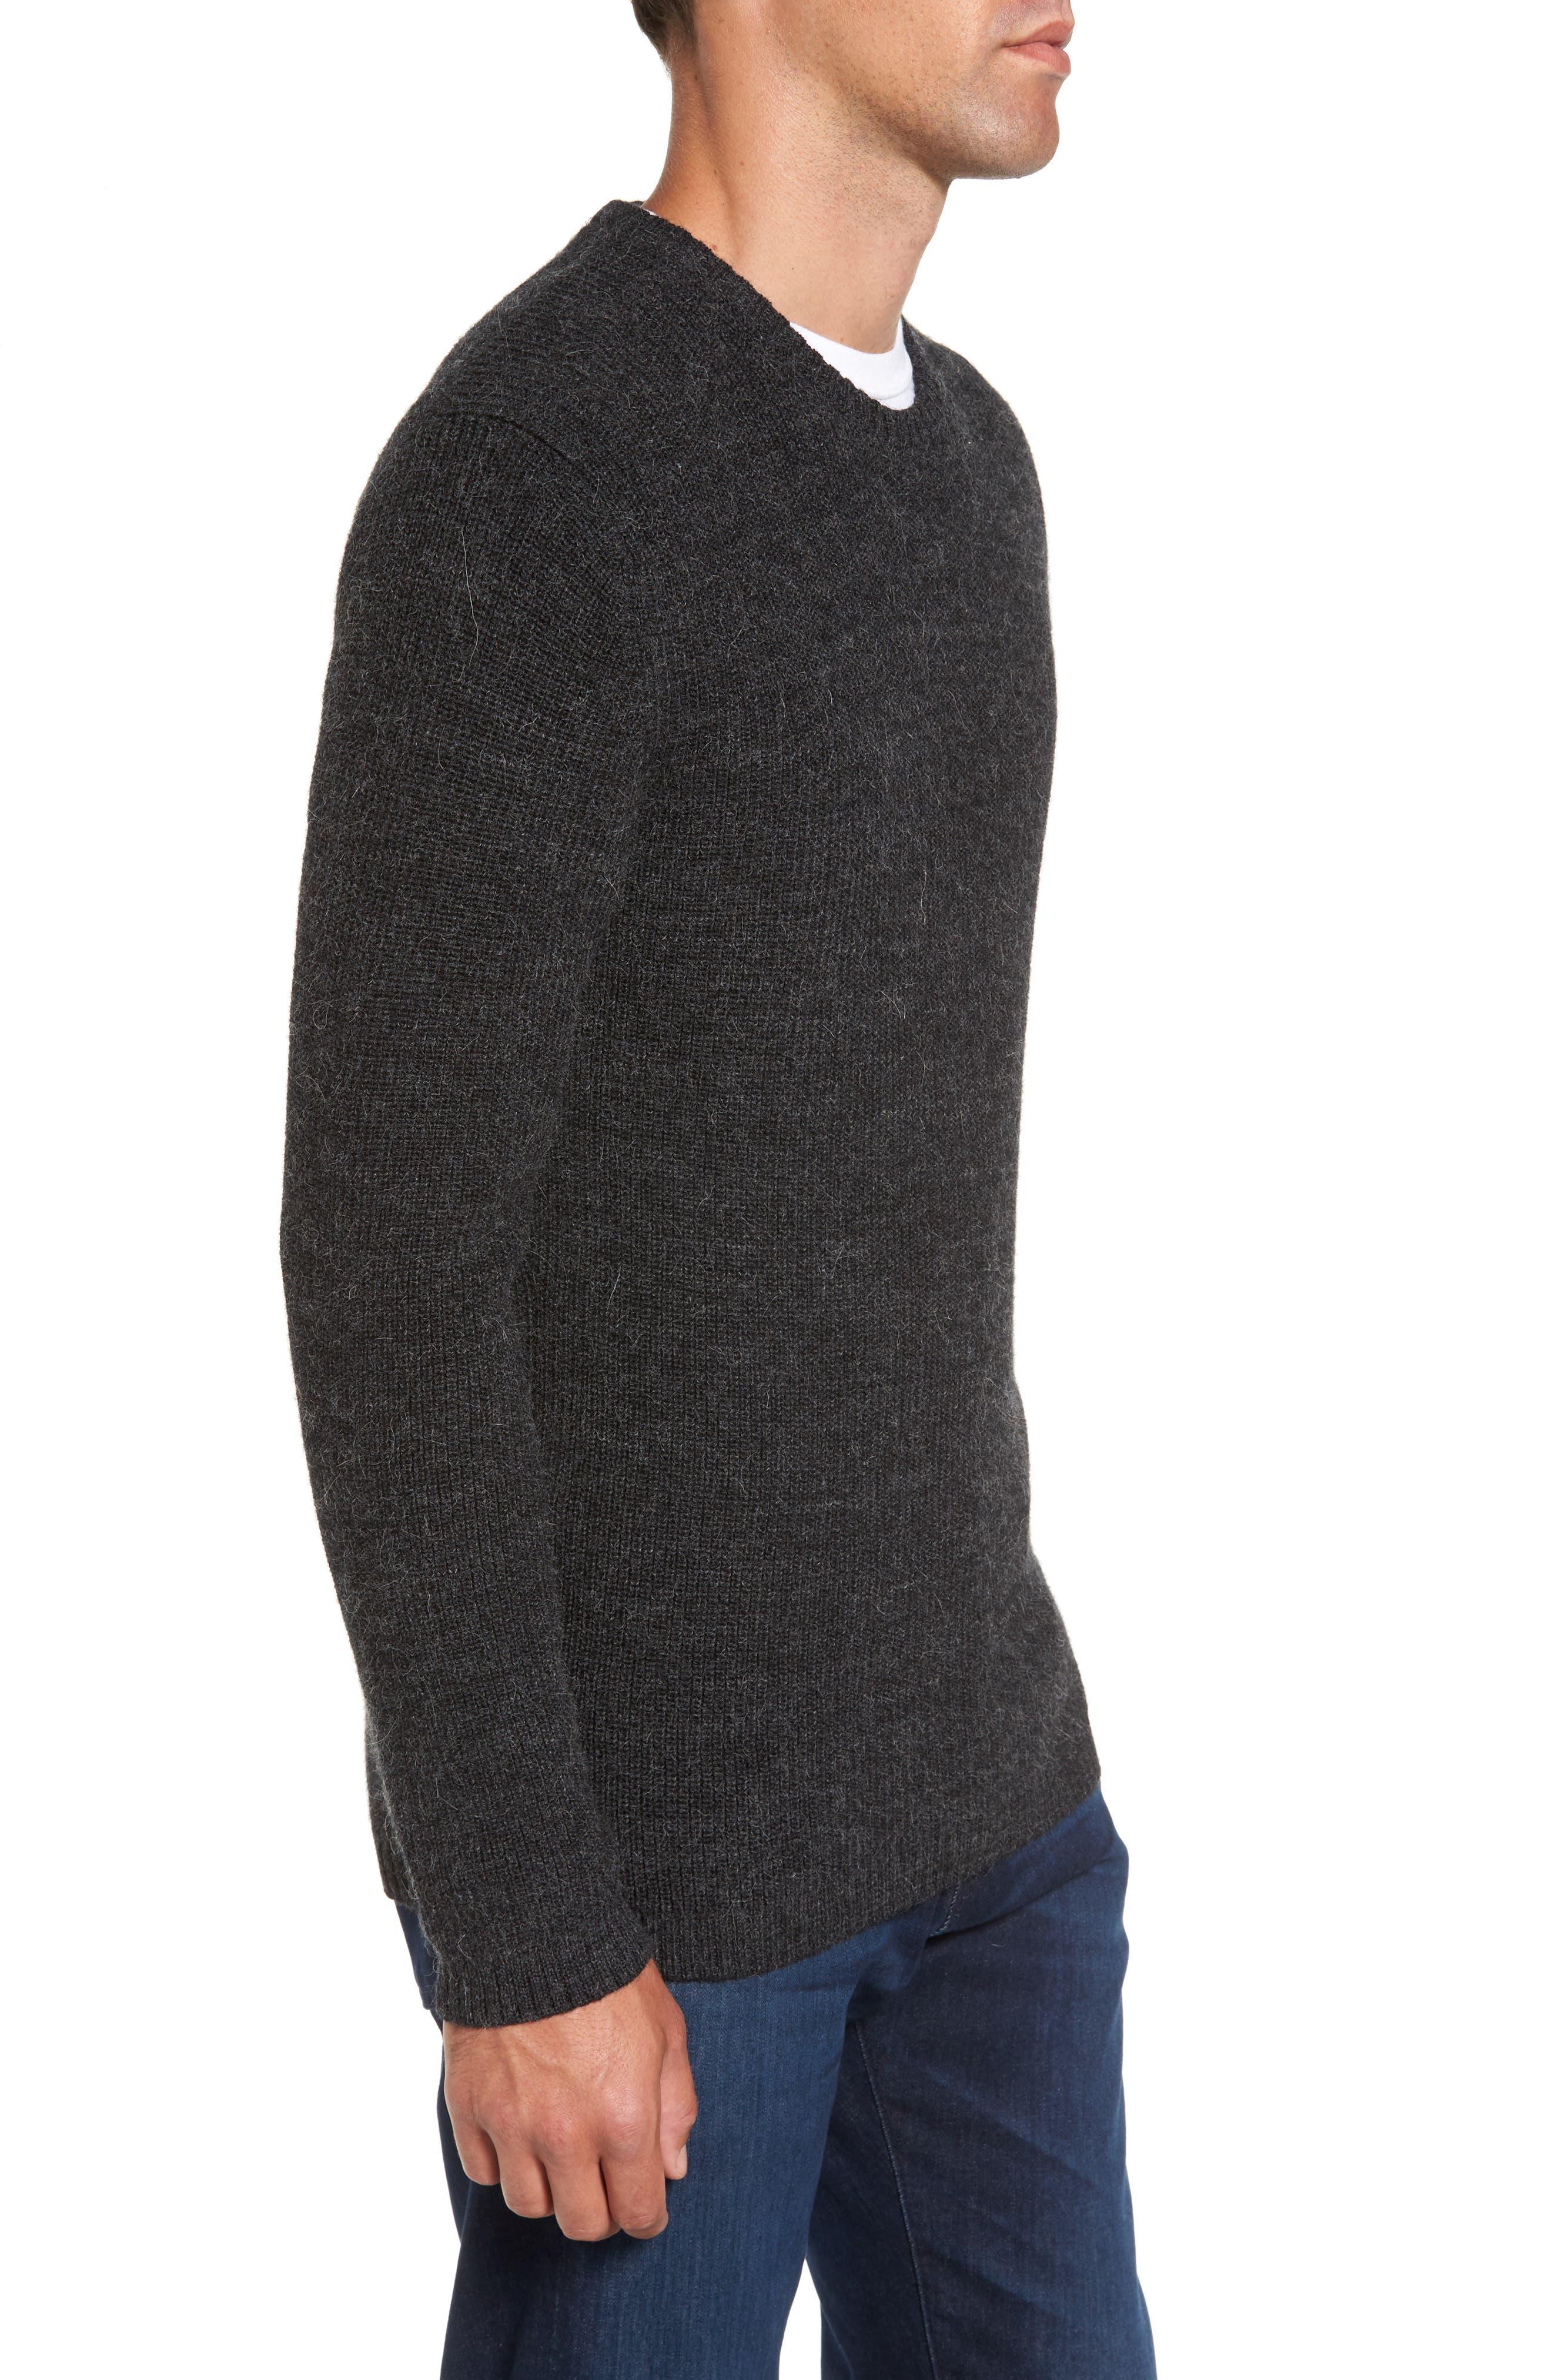 Whalers Bay Merino Wool Blend Sweater,                             Alternate thumbnail 3, color,                             001